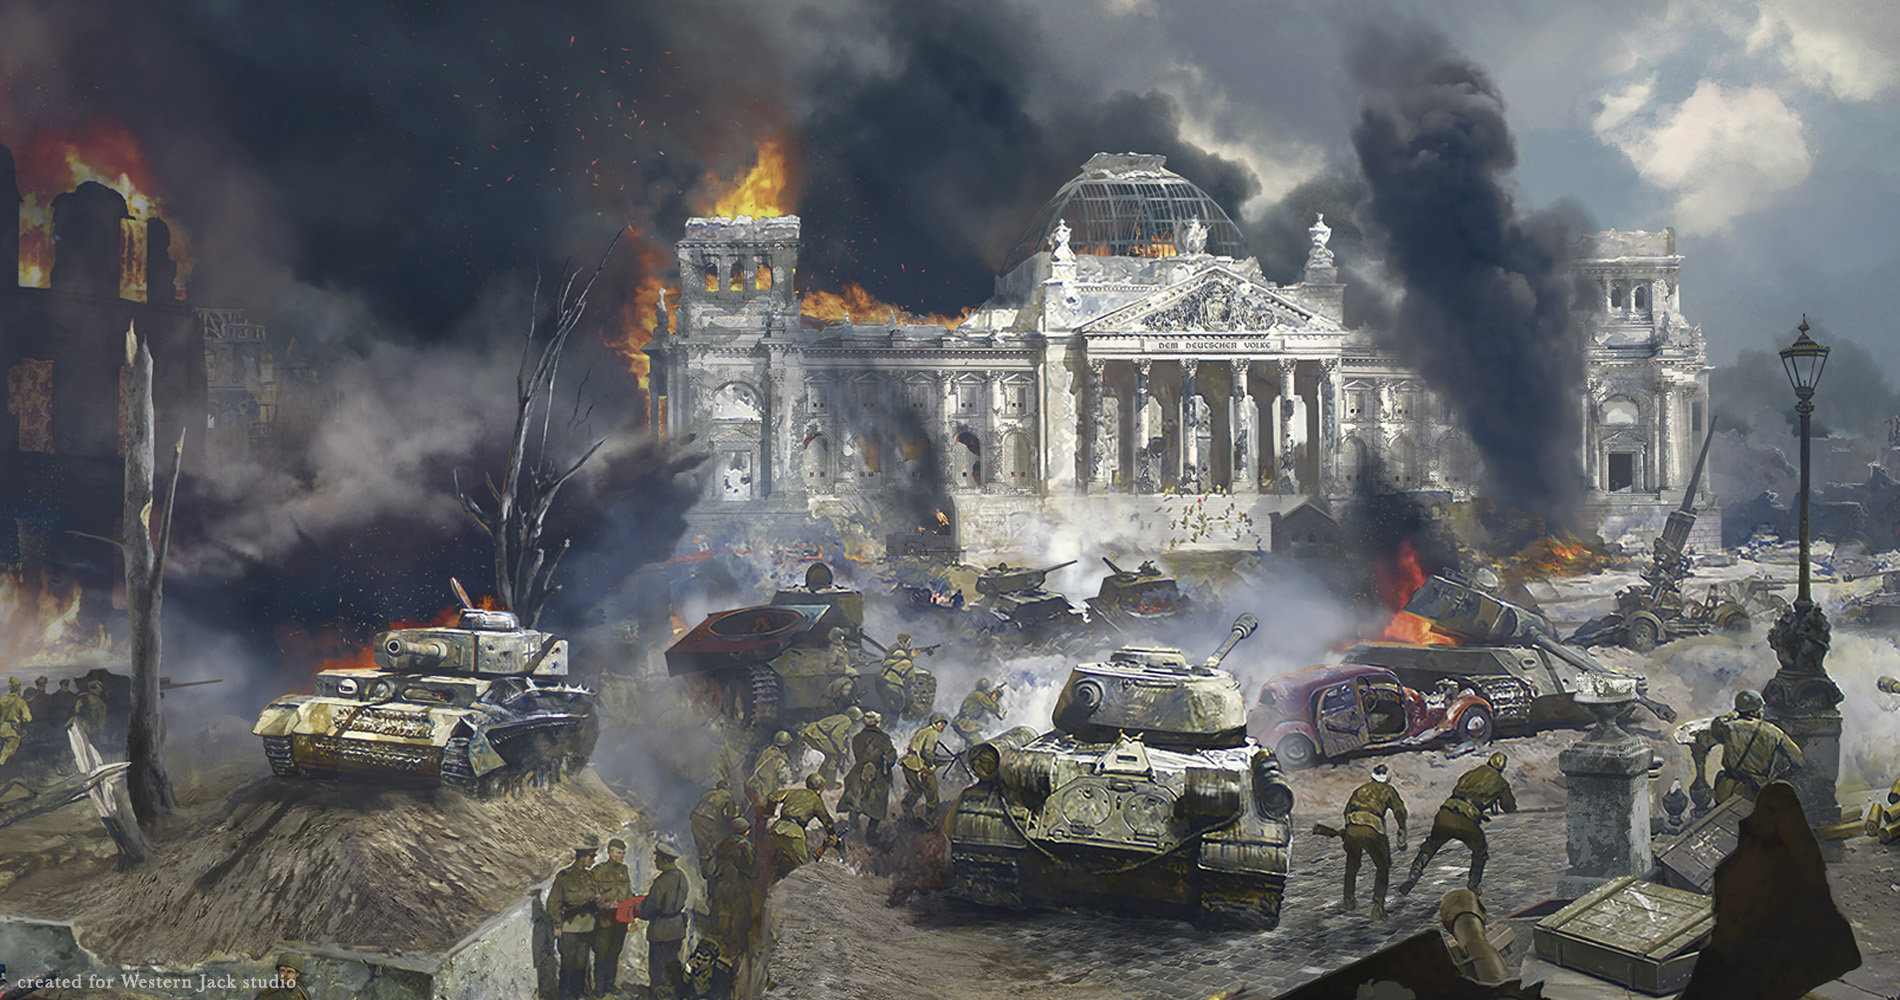 battle of berlin wallpaper - photo #19